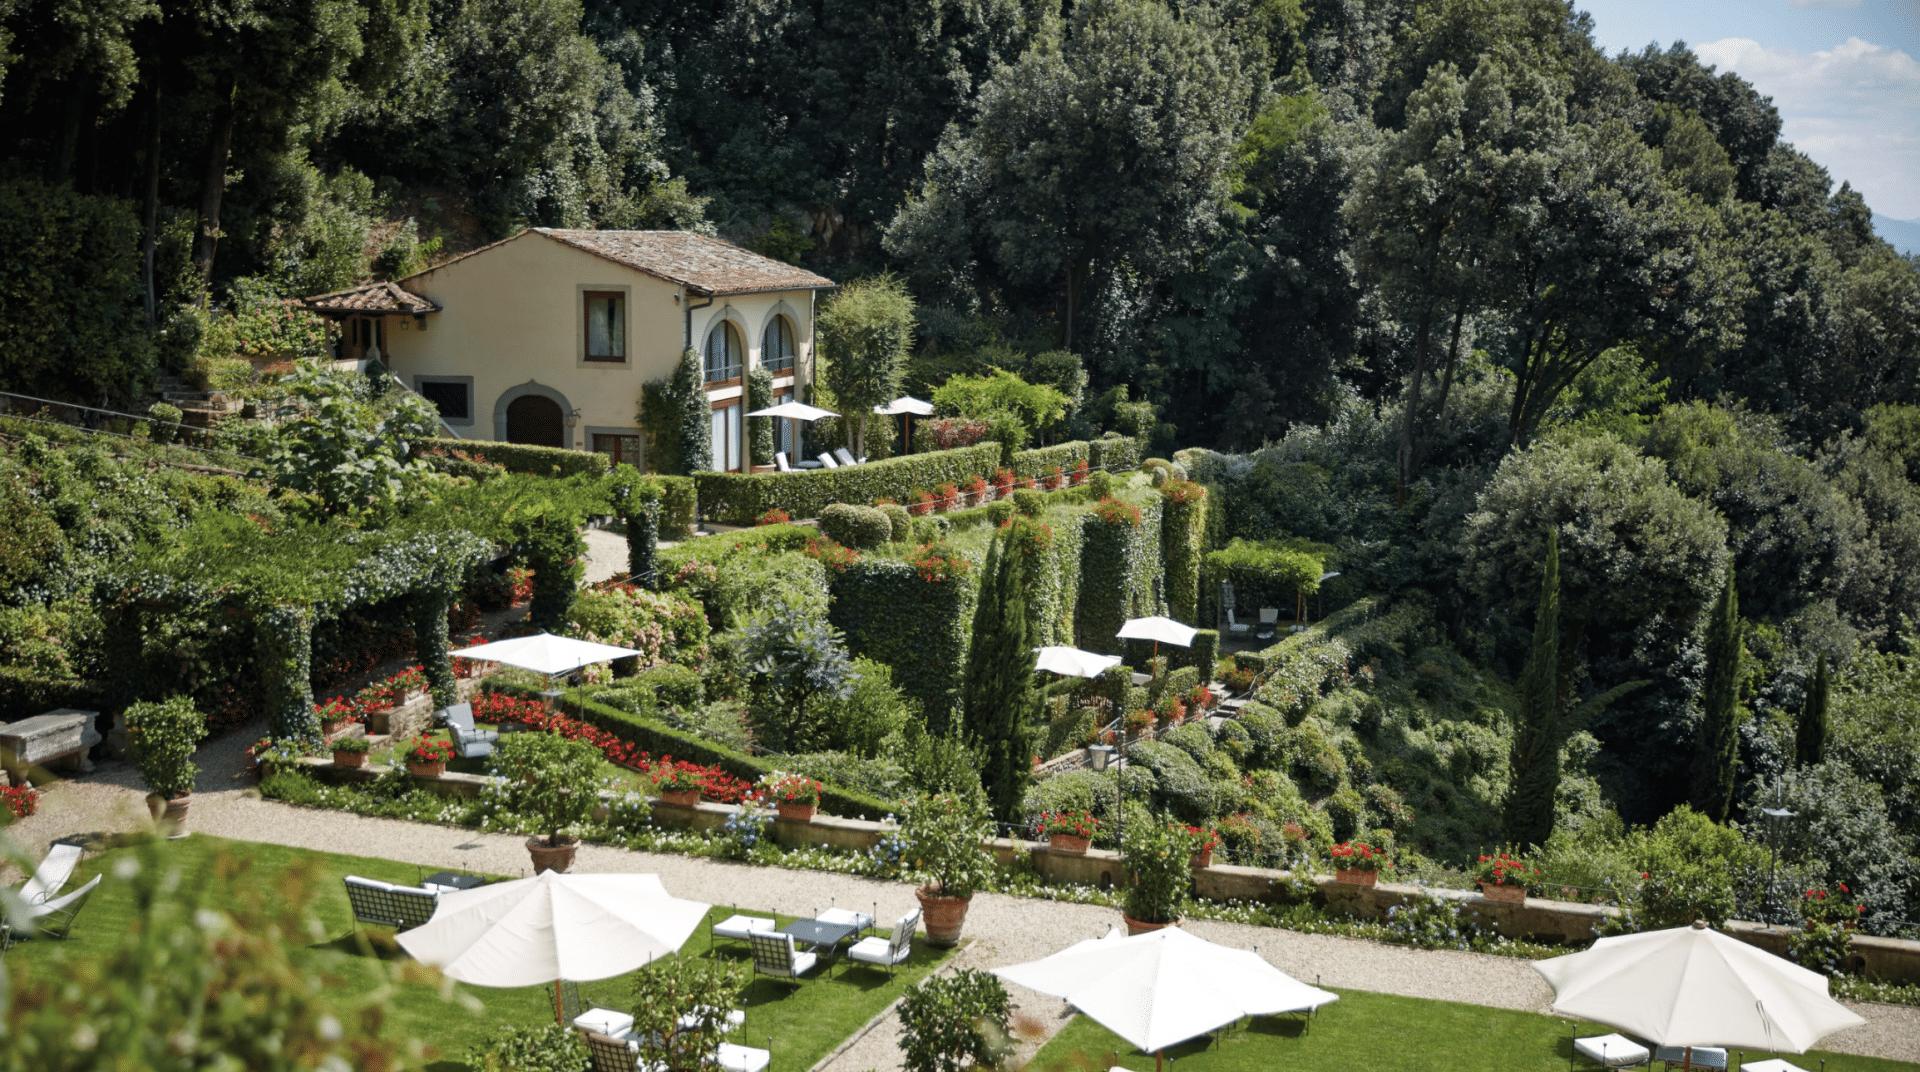 Belmond Villa San Michele Garten, Florenz